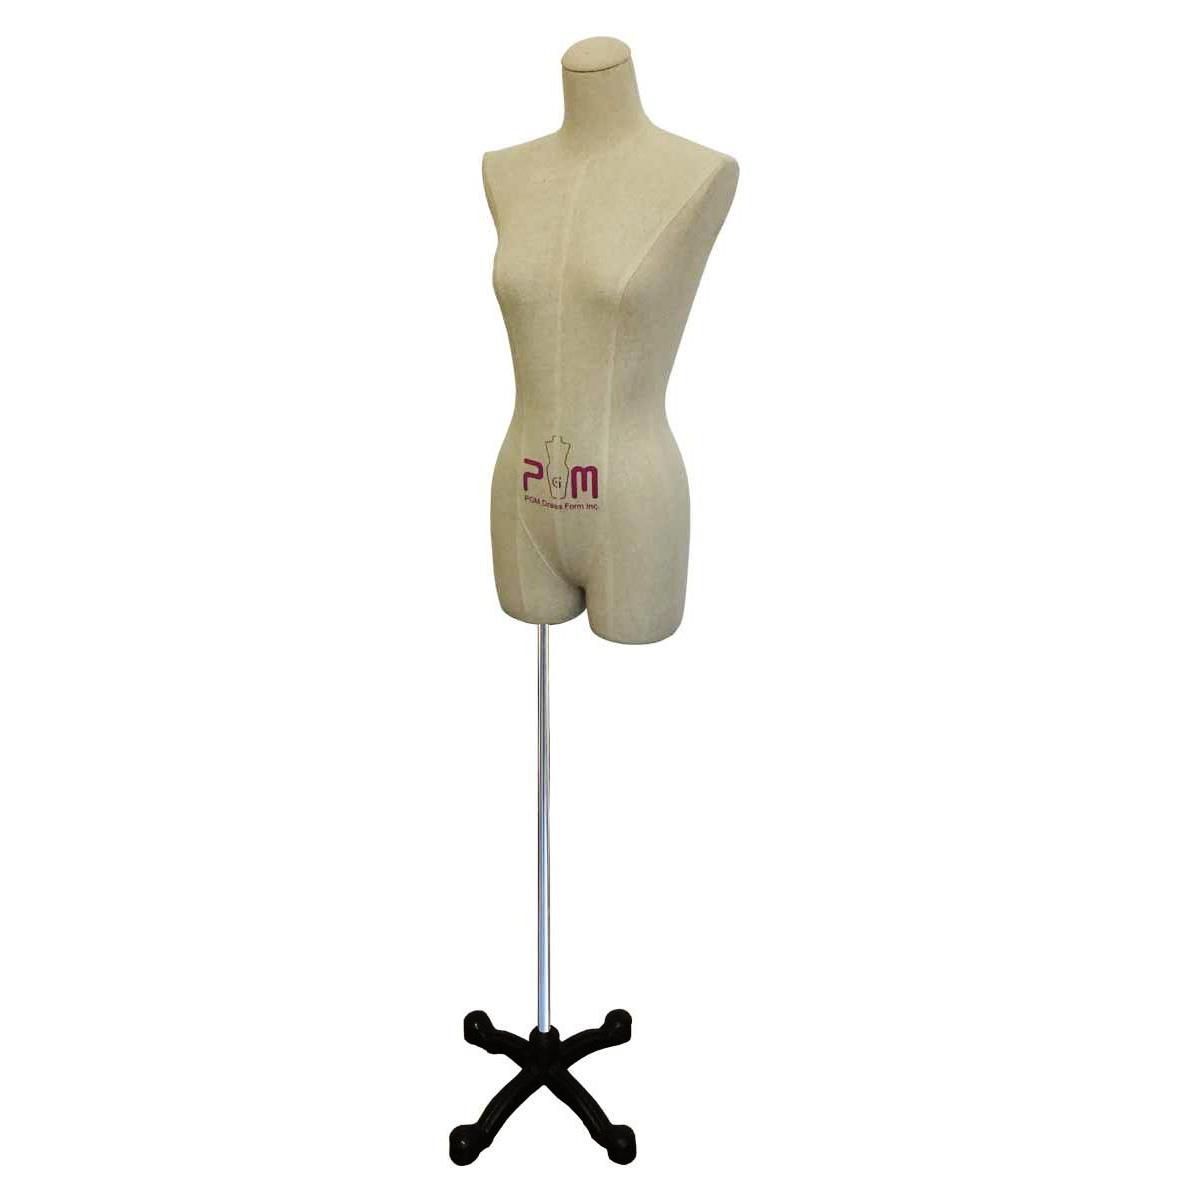 PGM-Pro 602F - Lingerie and Bridal Dress Form